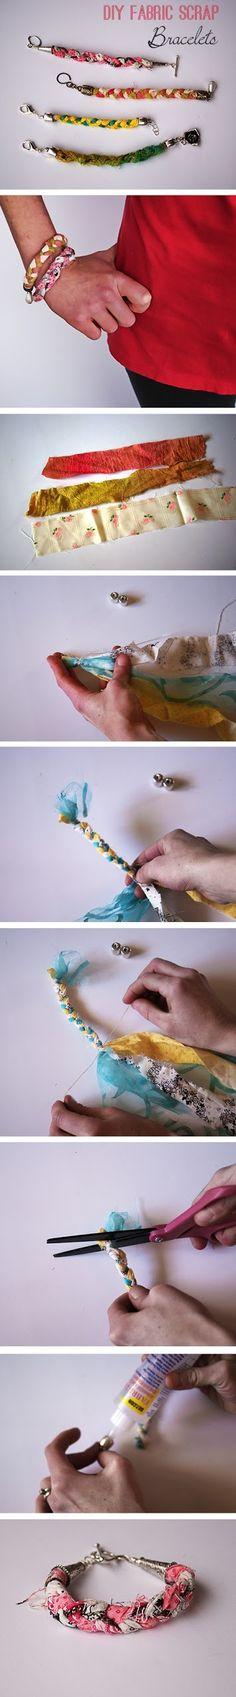 Diy : Easy Scrap Fabric Bracelet